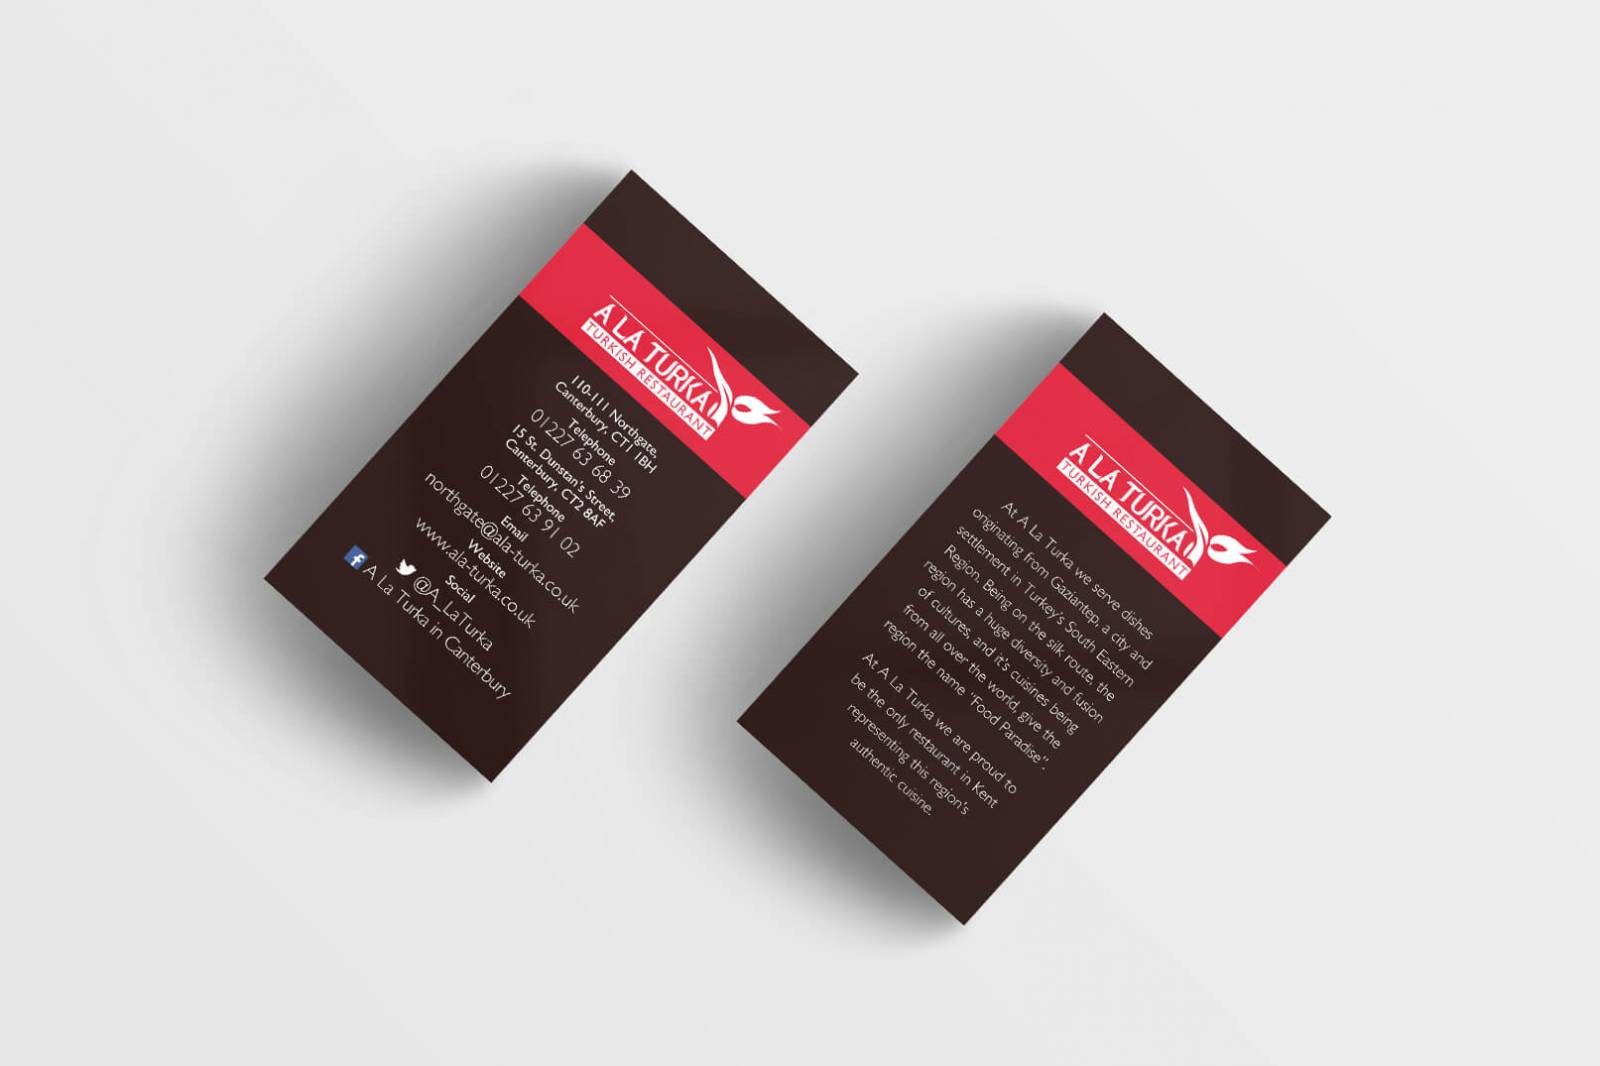 A-la-turka-business-card-design-agency-graphic-design-canterbury.jpg